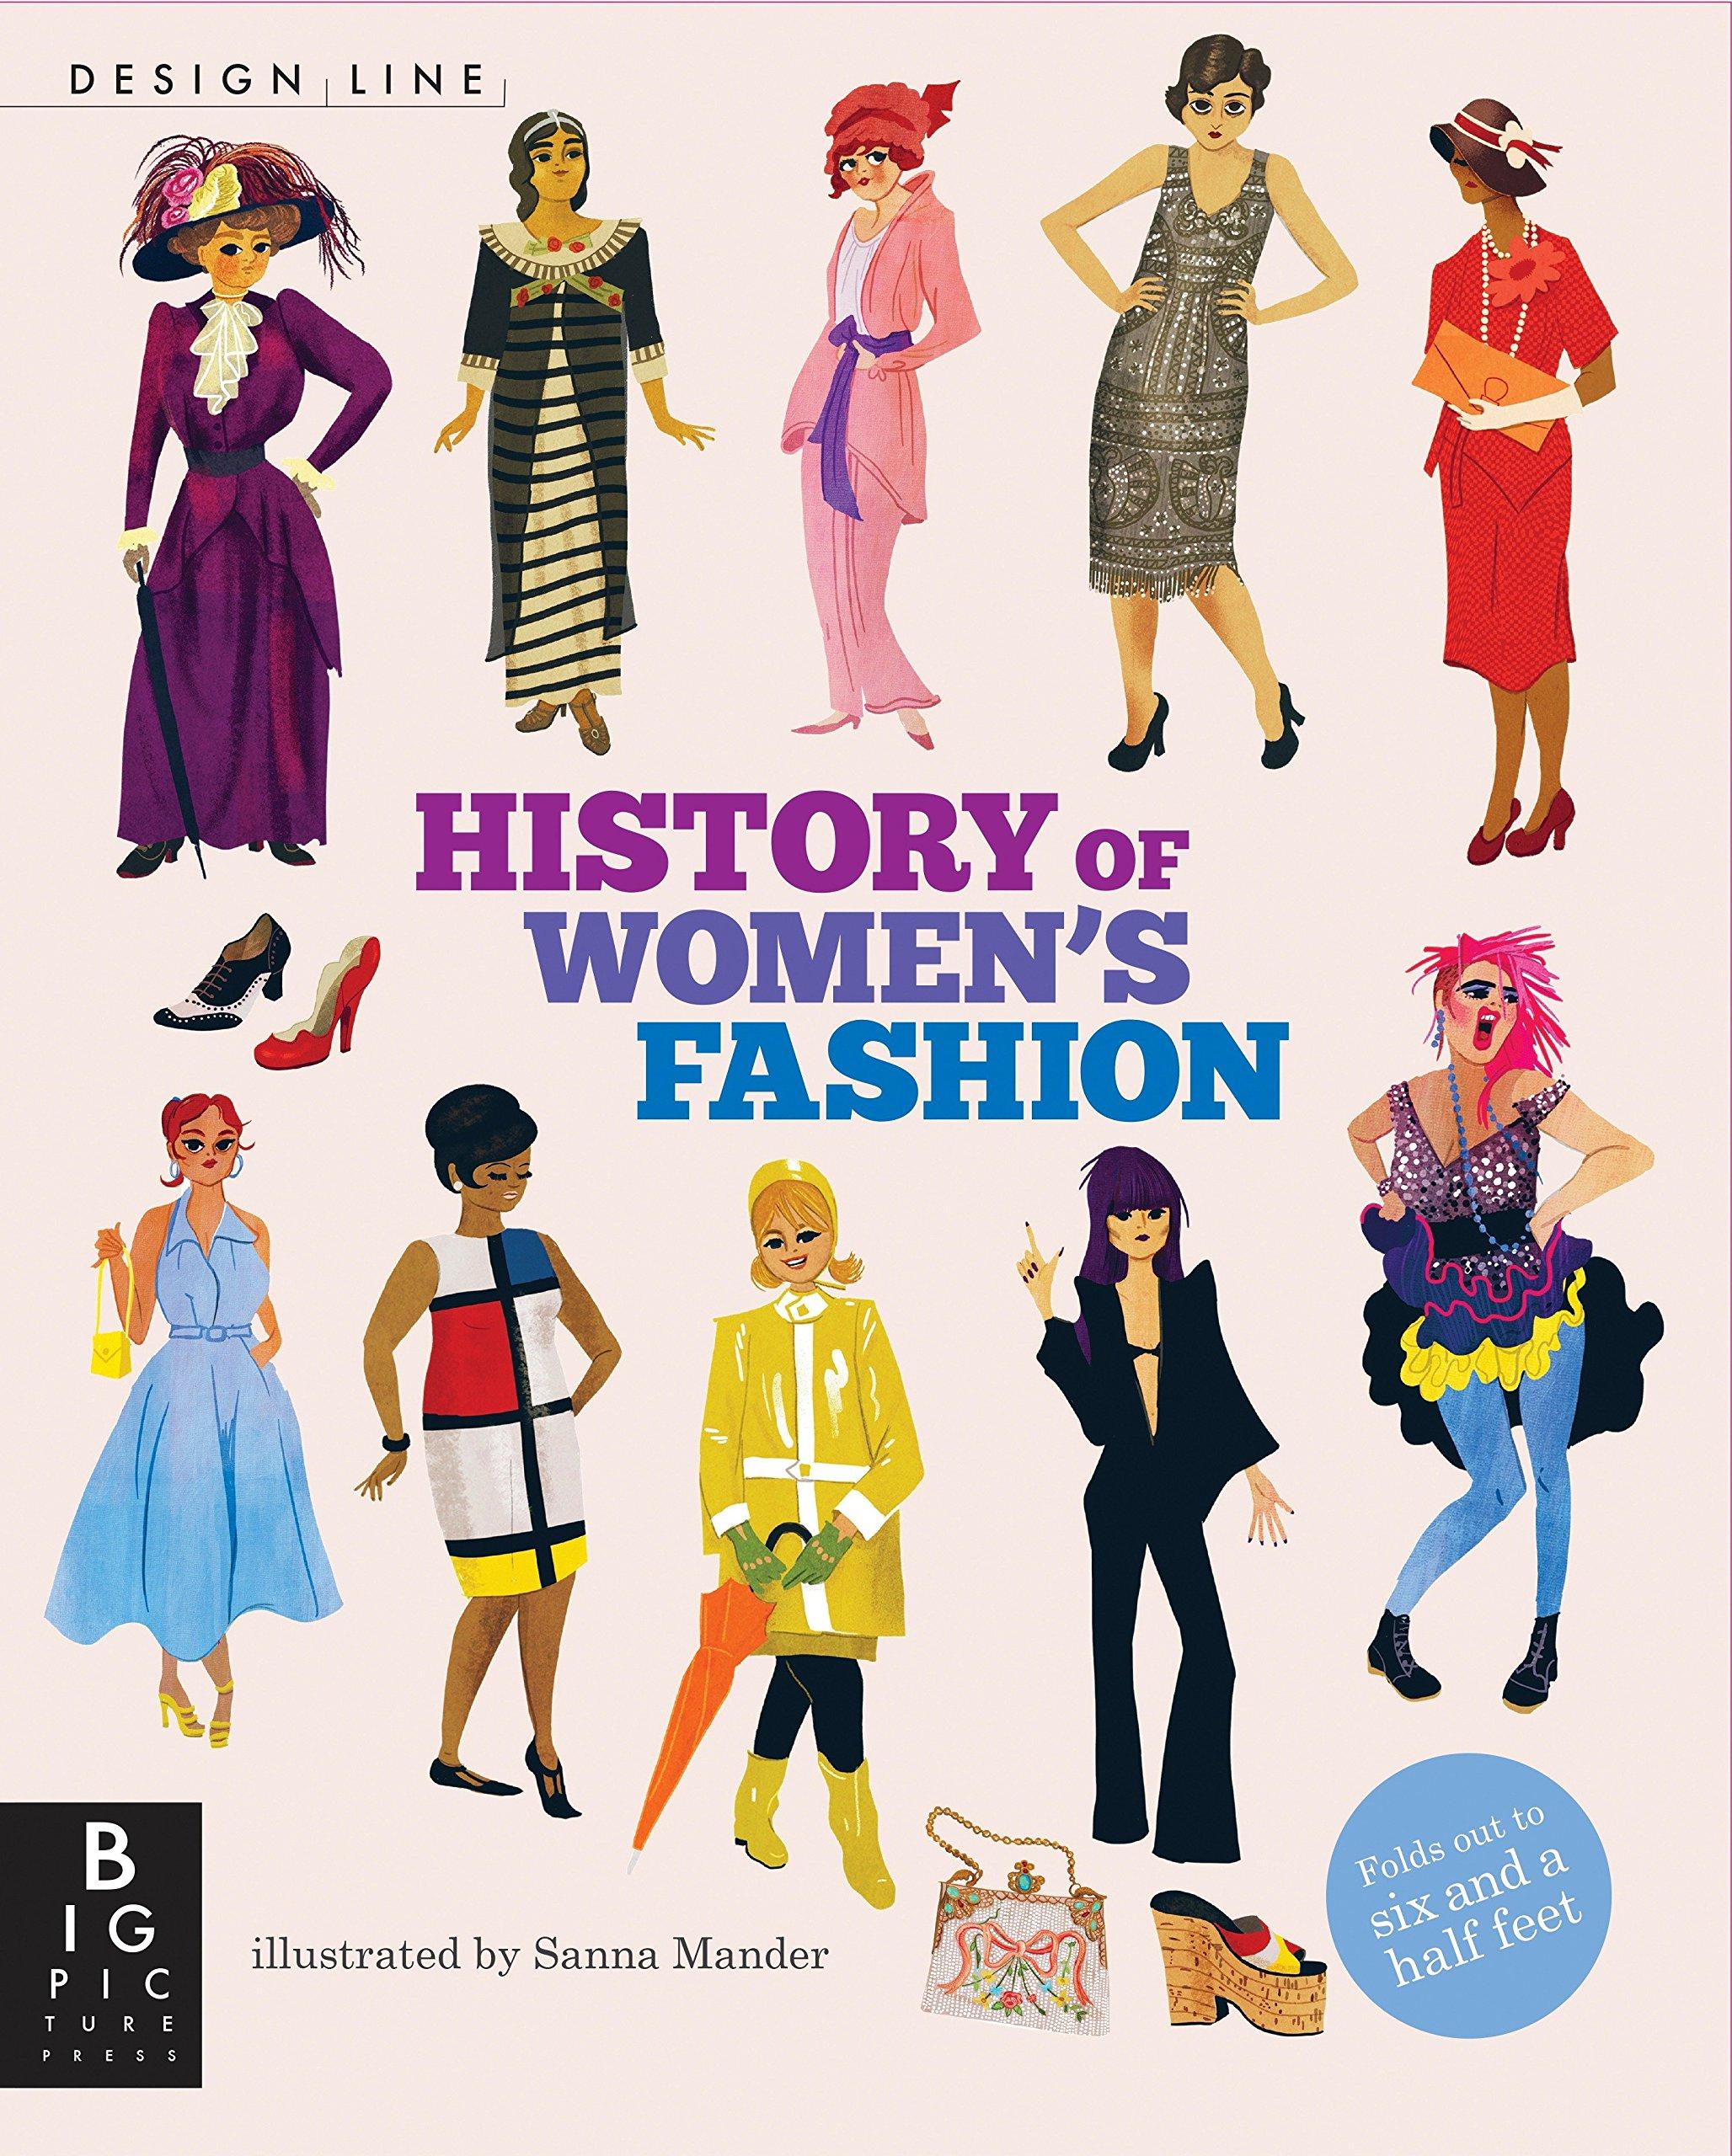 Design Line History Of Women S Fashion Slee Natasha Mander Sanna 9780763679620 Amazon Com Books